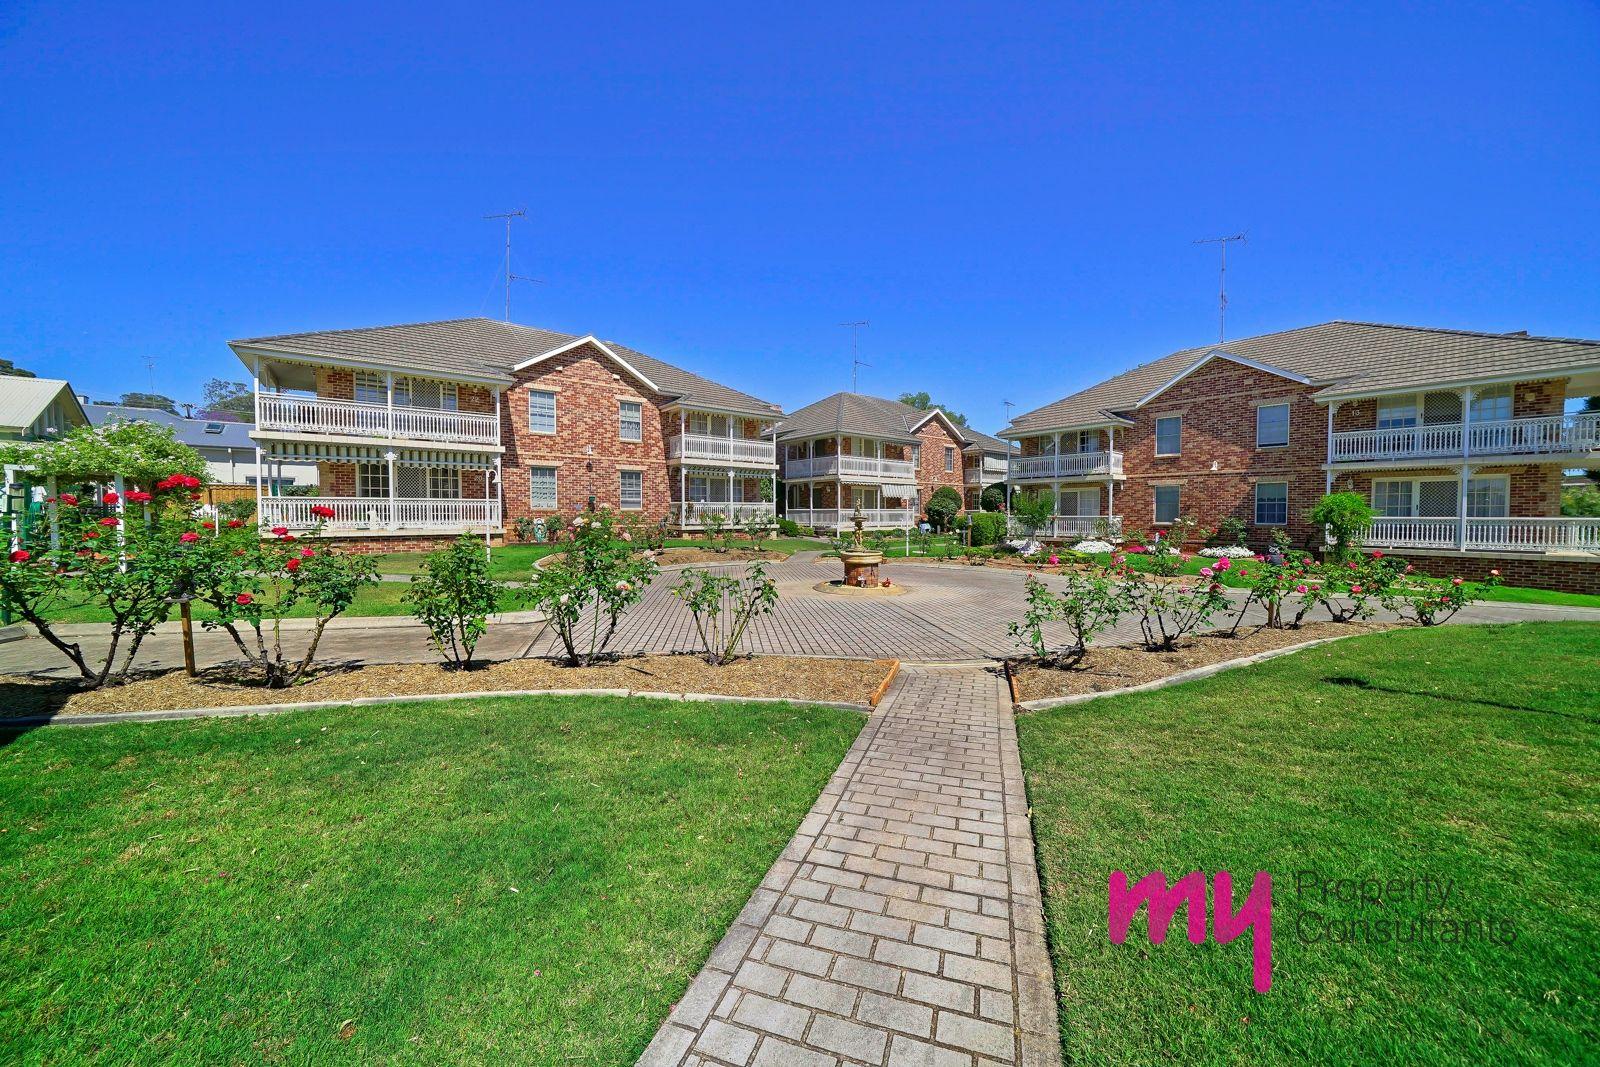 20/14-20 Barsden Street, Camden NSW 2570, Image 1